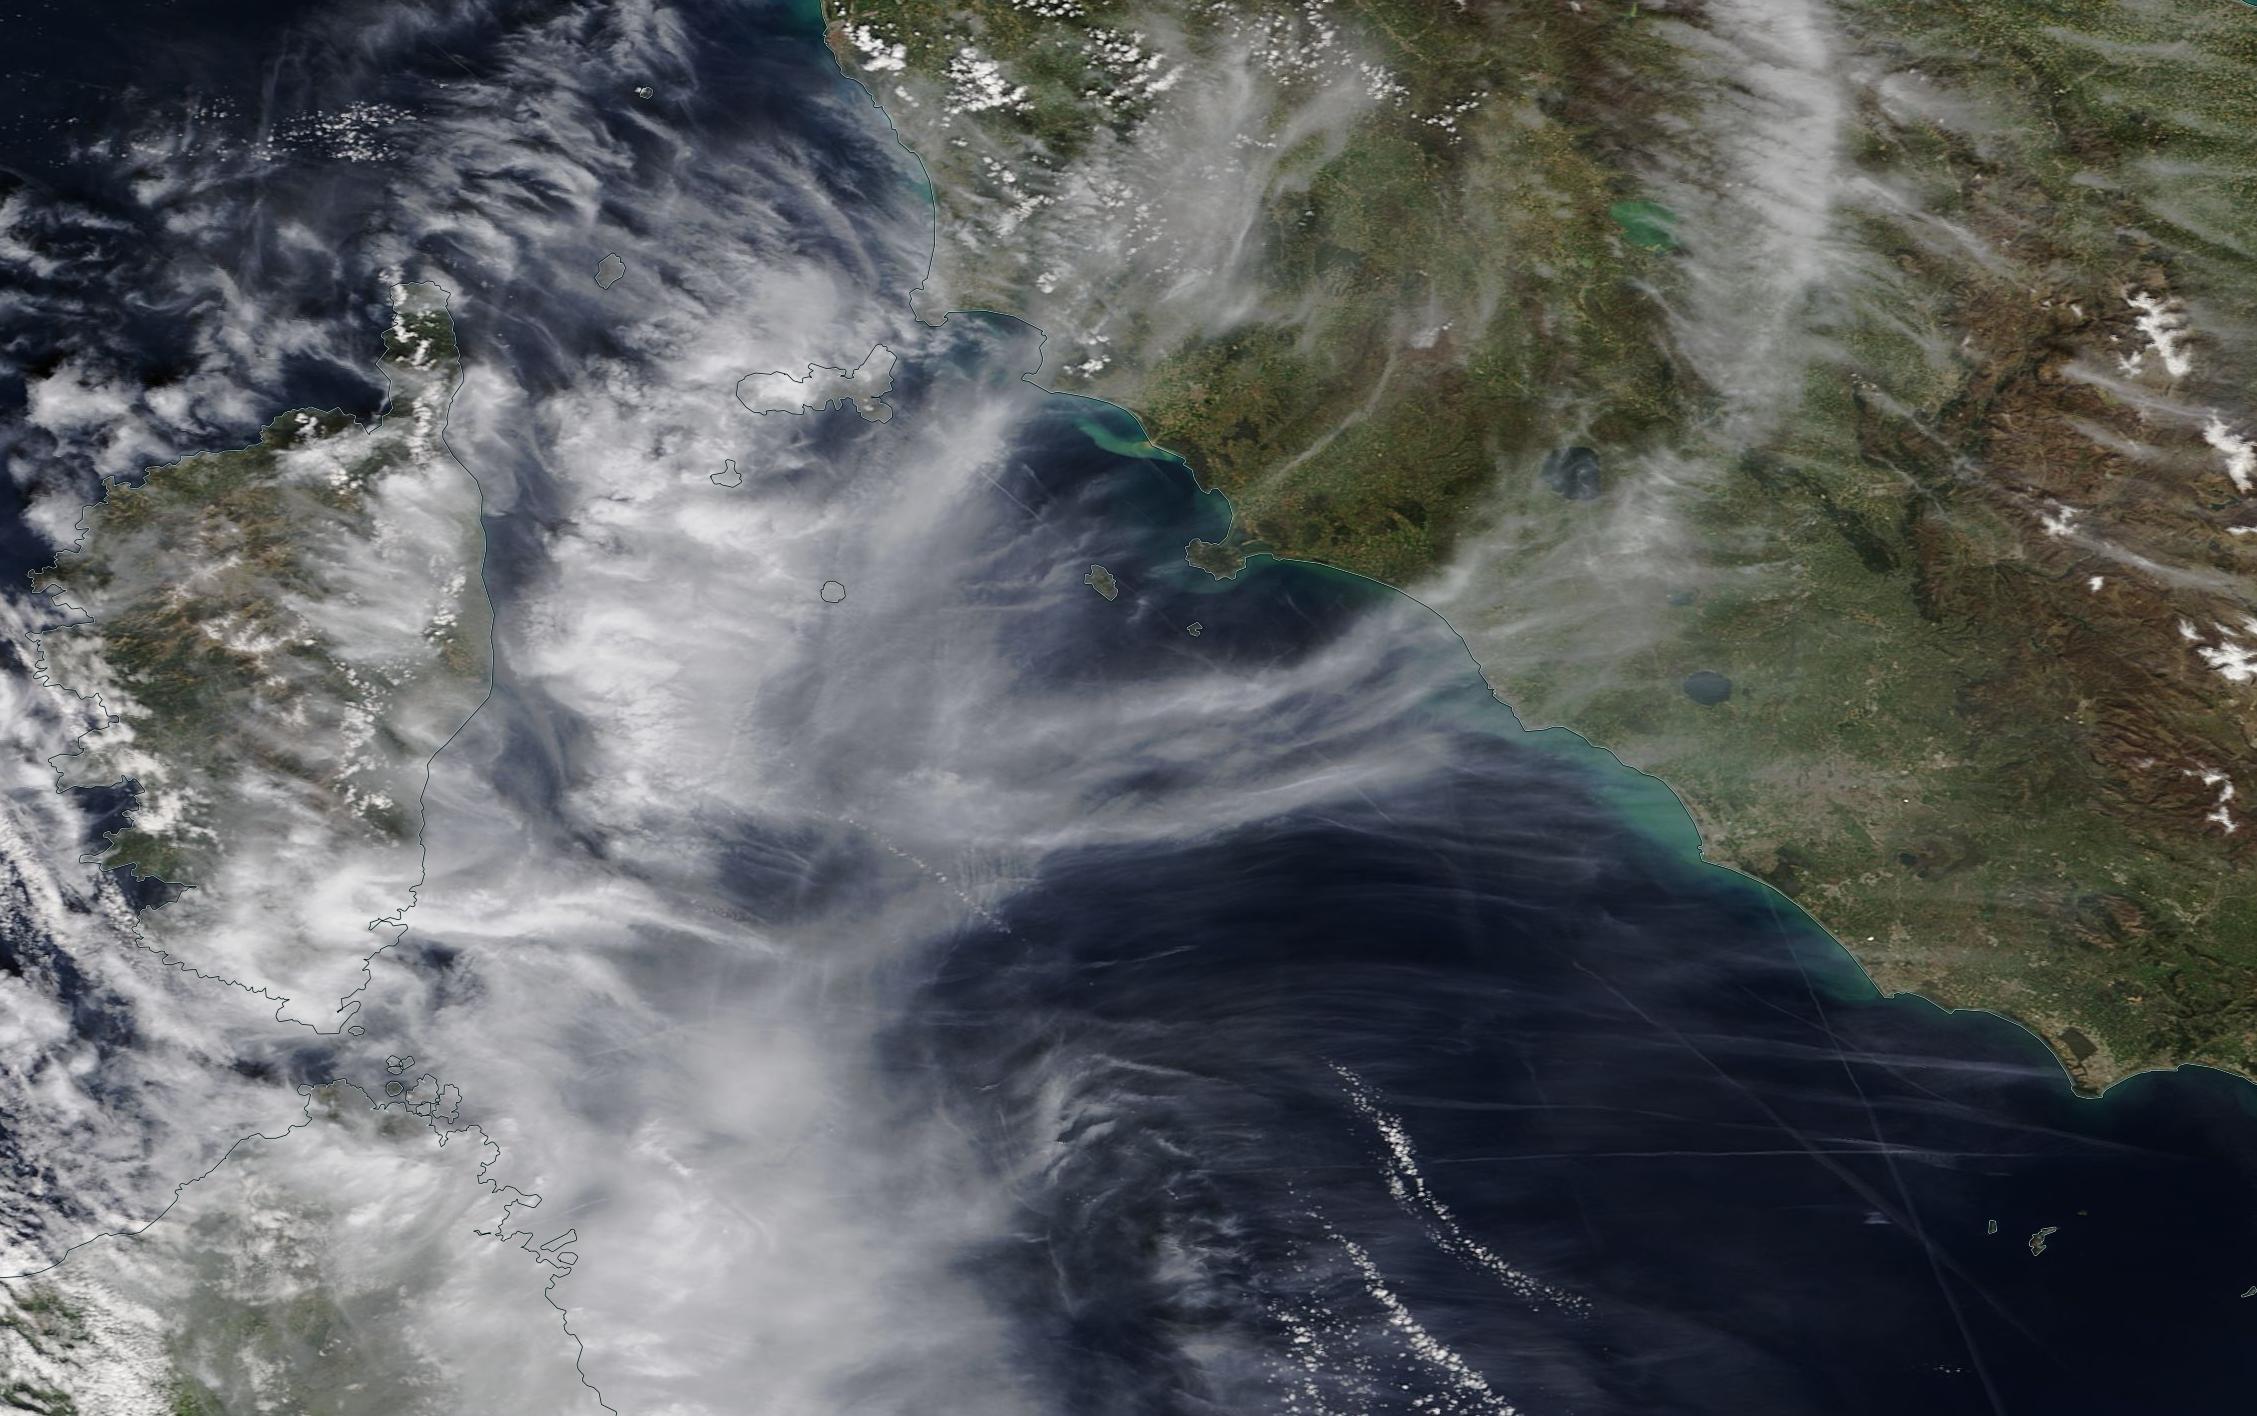 chemtrails geoengineering Corsica Sardina Italia 6 April 2019 ... chemtrail geoengineering English Channel Brittany 6 April 2019 ... https://go.nasa.gov/2UAhXtn